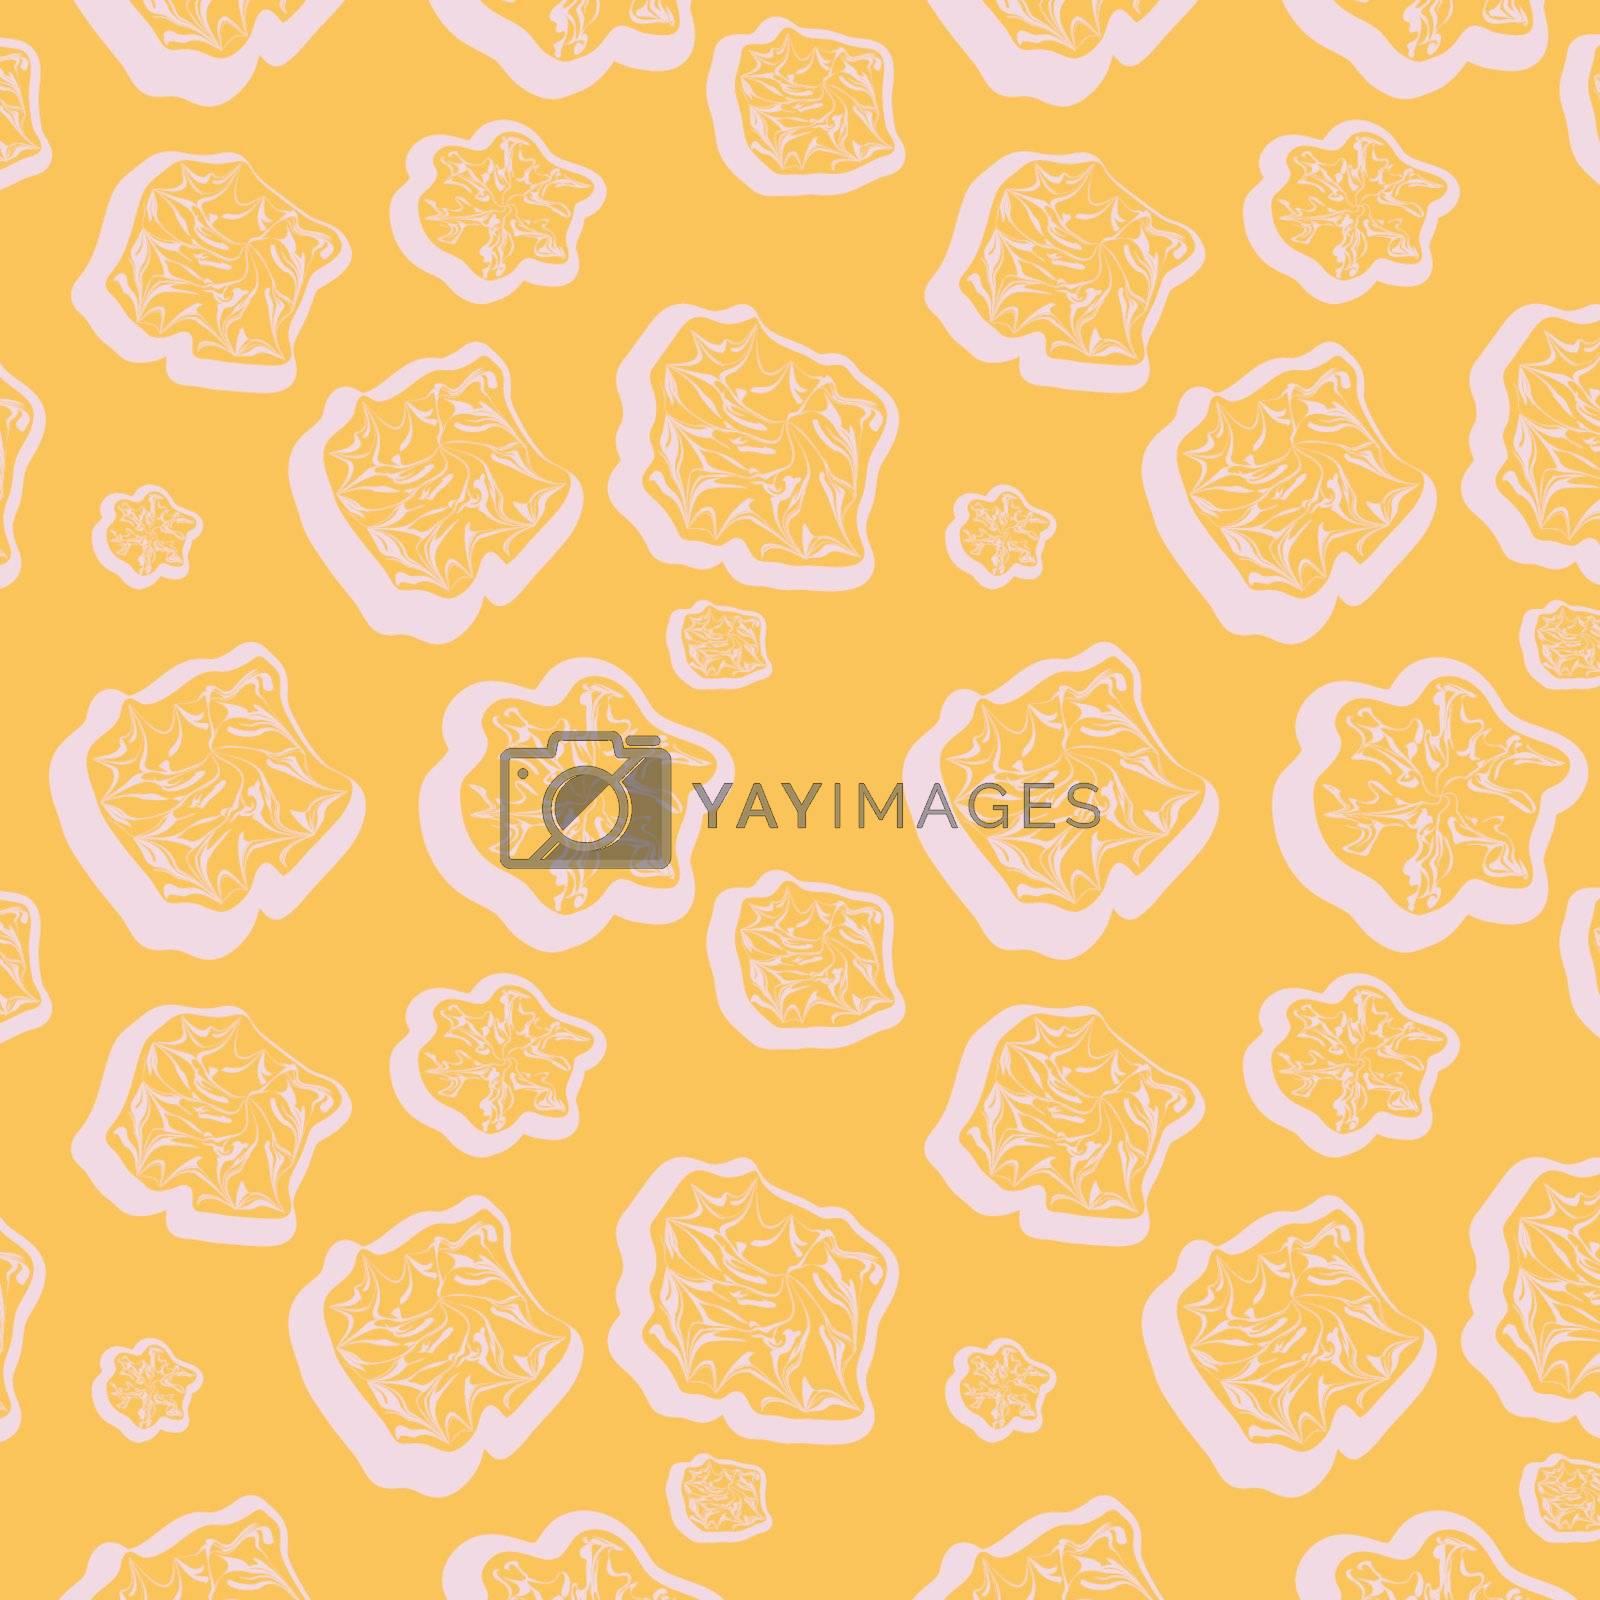 Original seamless background, vector, illustration